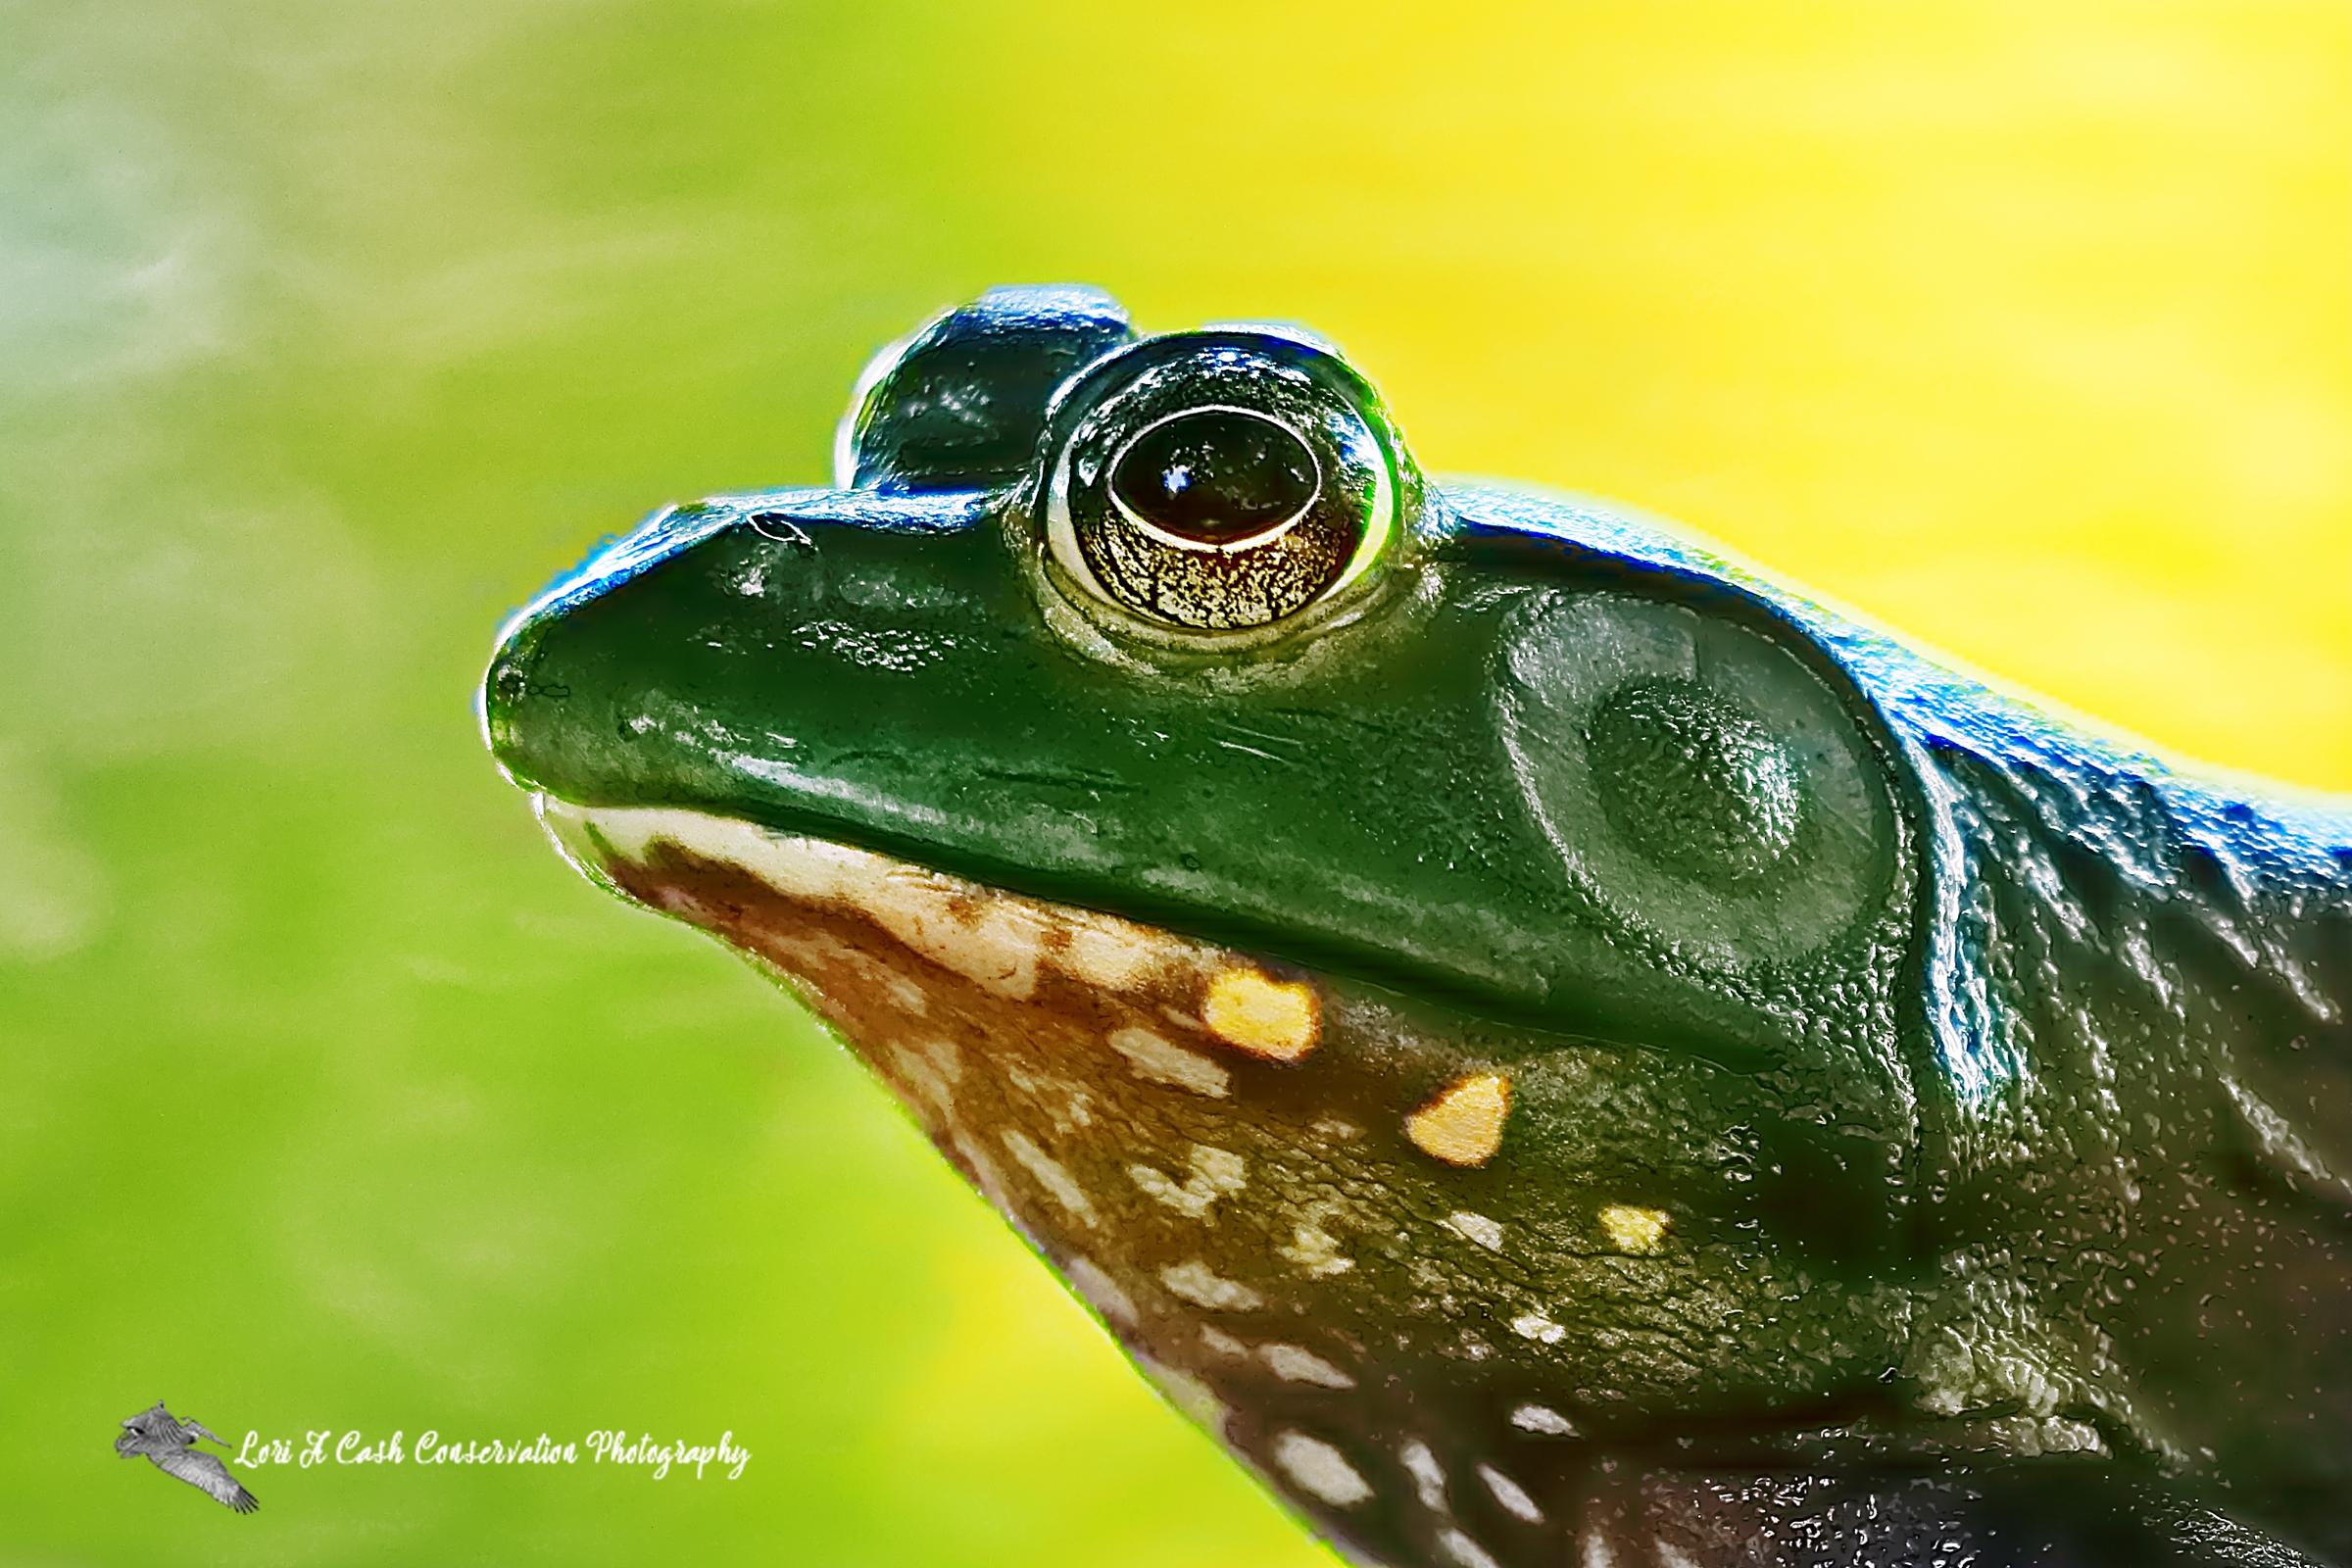 Up close side profile of an American bullfrog at the Norfolk Botanical Garden in Norfolk, Virginia.